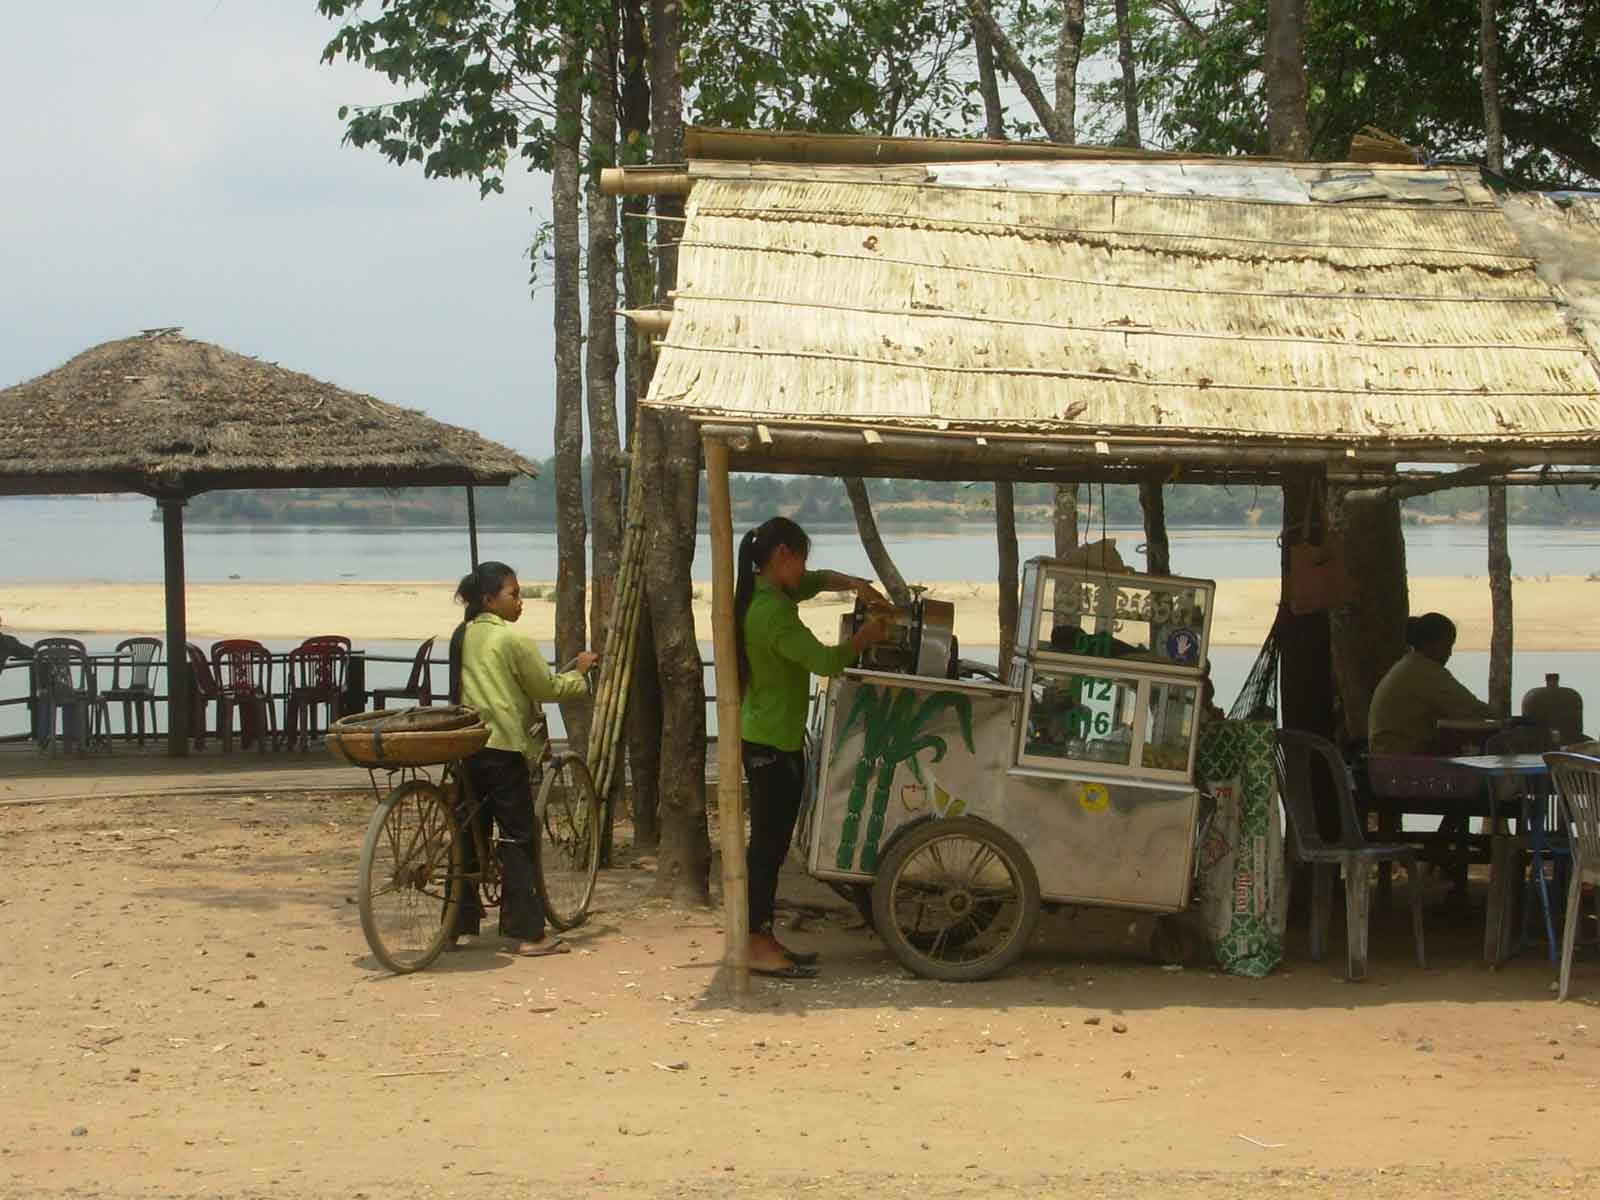 rondreis cambodja kratie en koh trong hoogtepunt 12